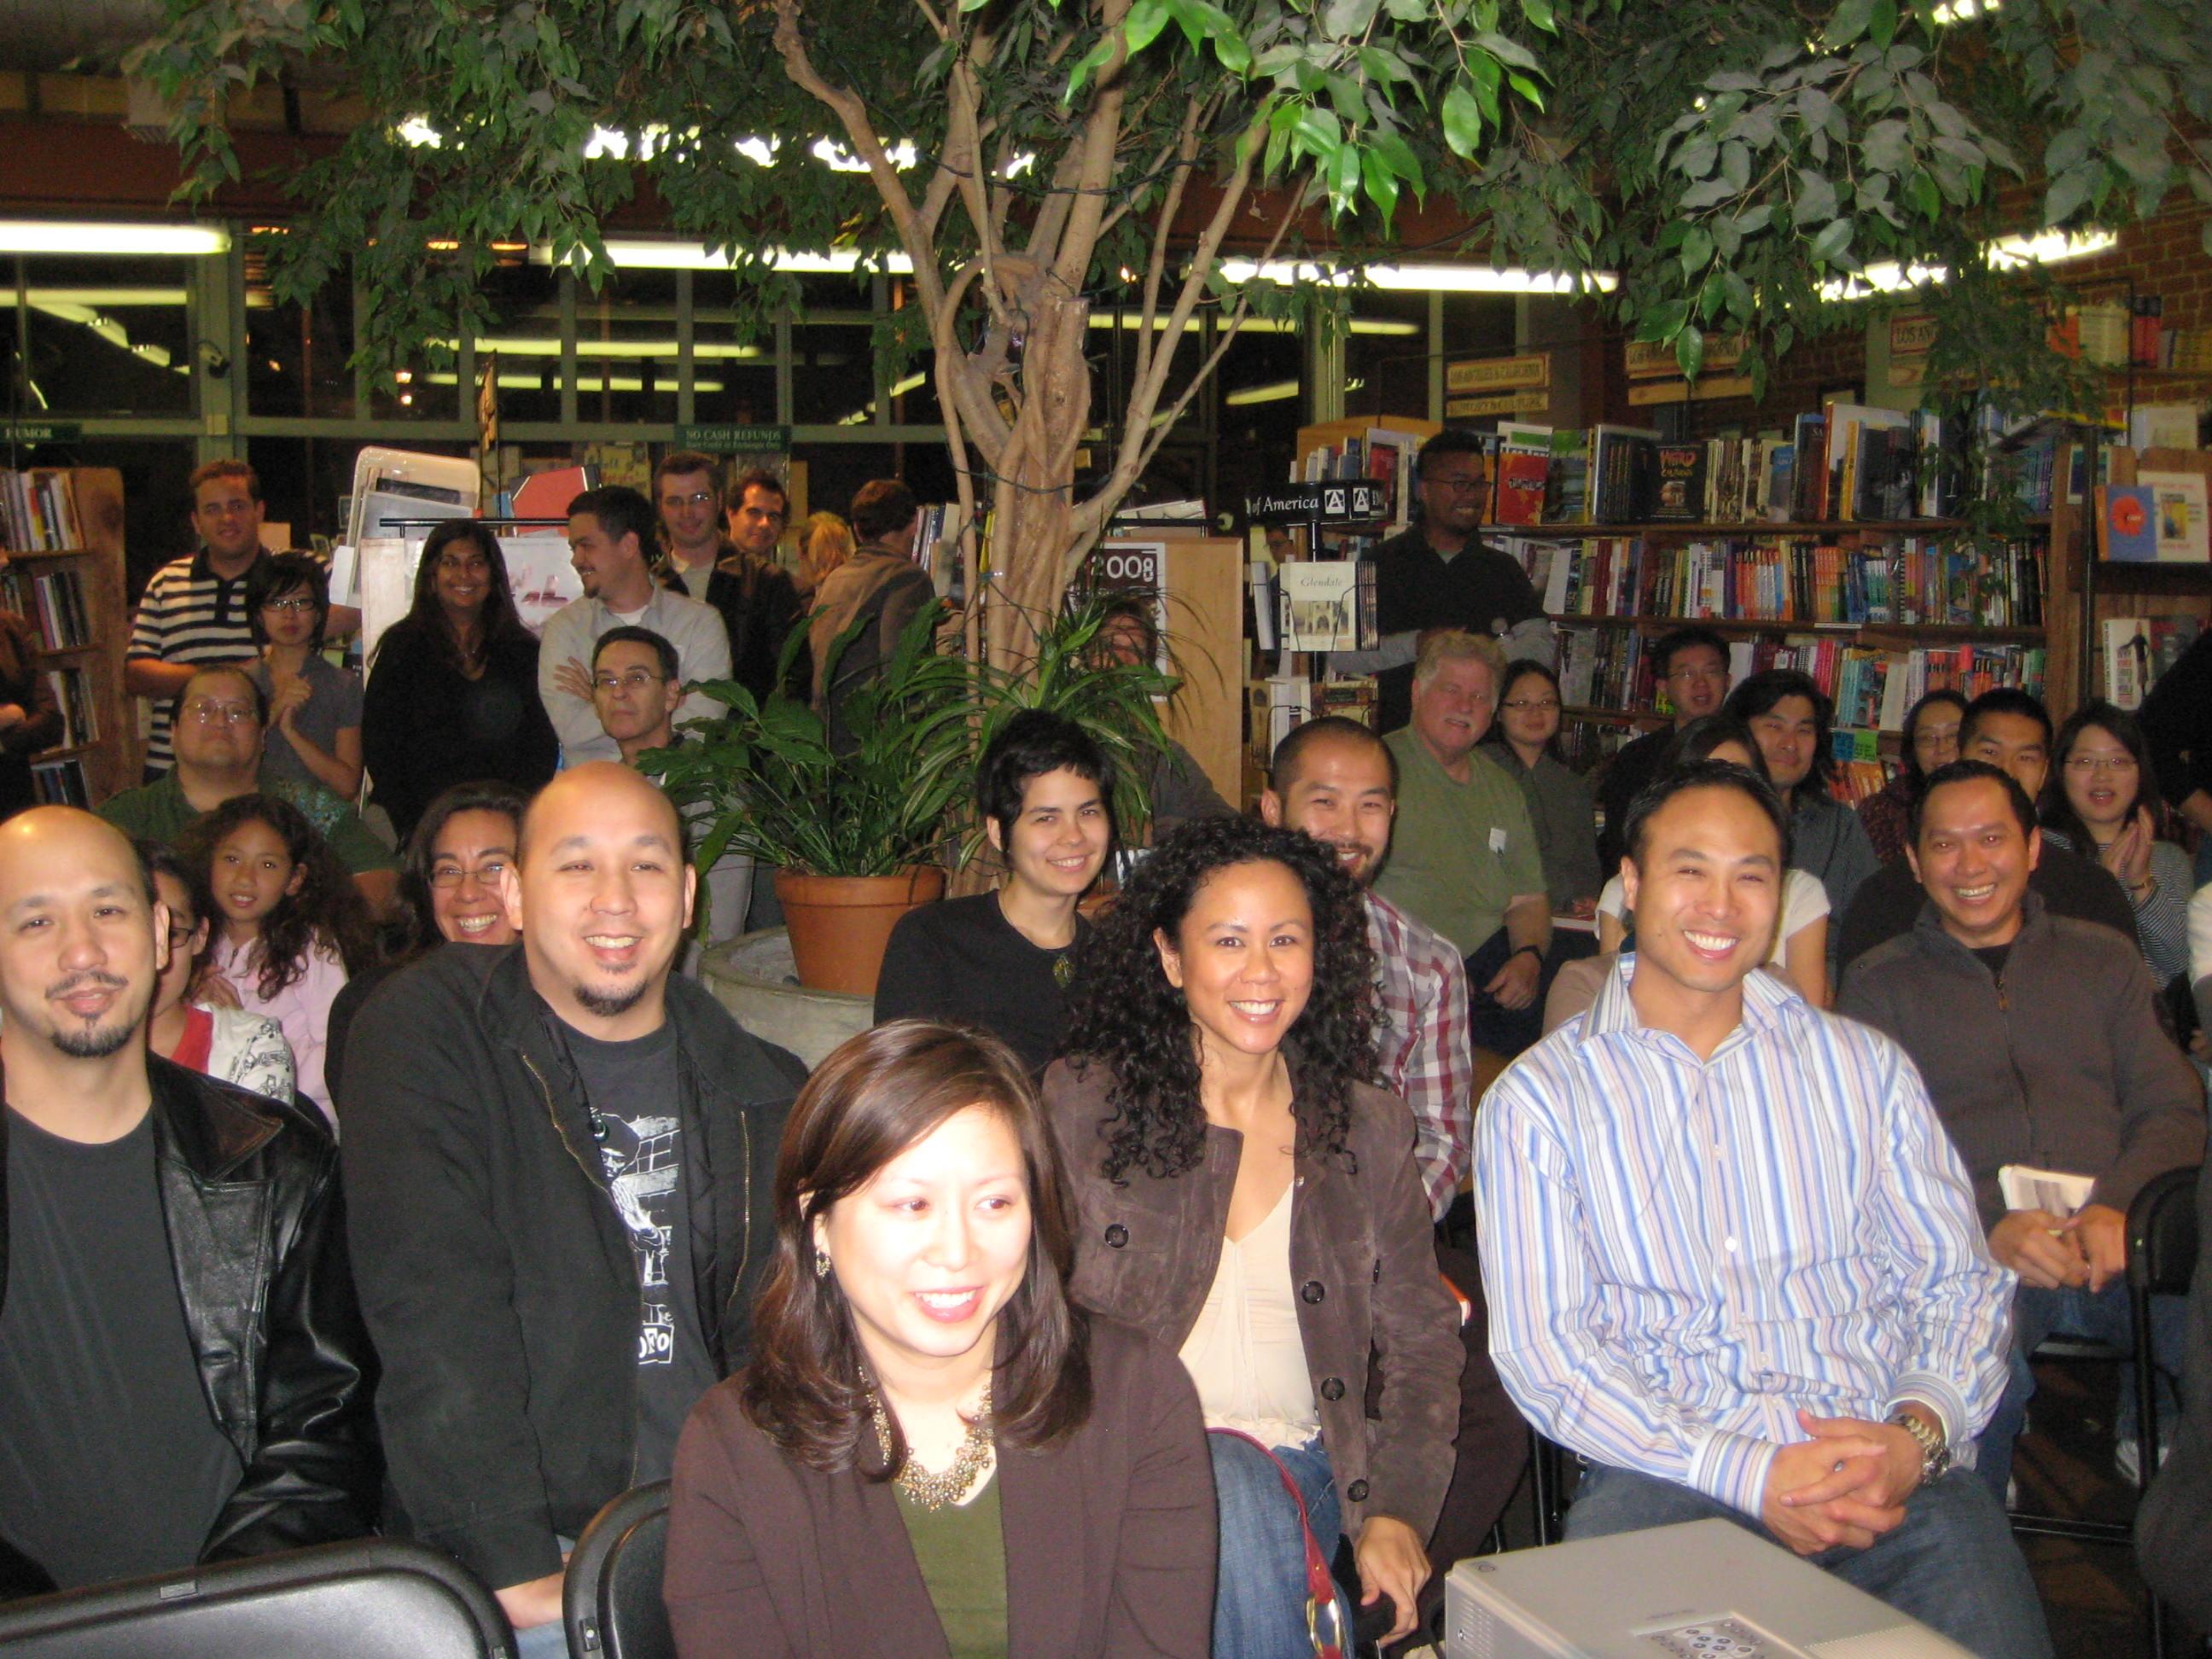 skylightbookstore.JPG